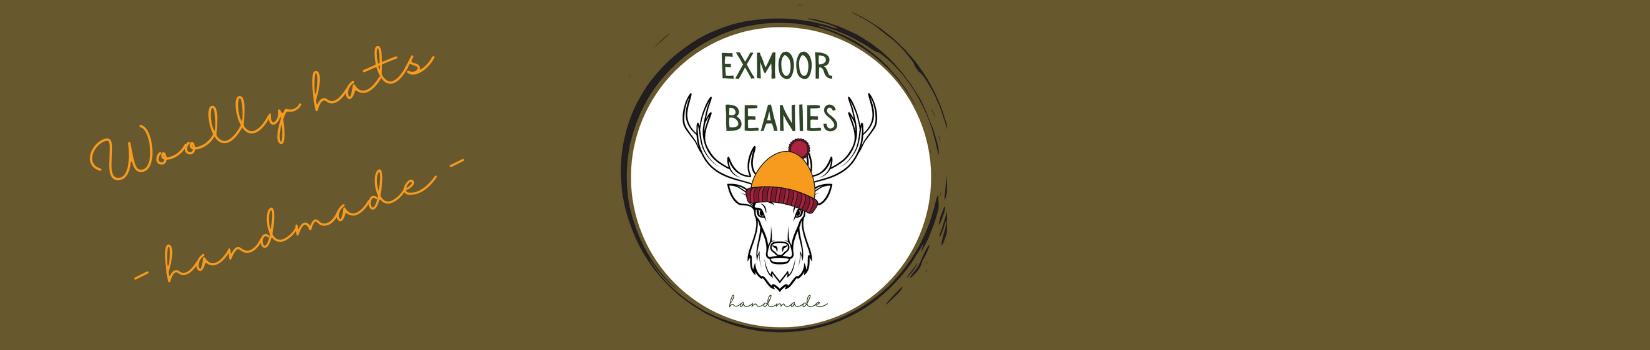 Exmoor Beanies